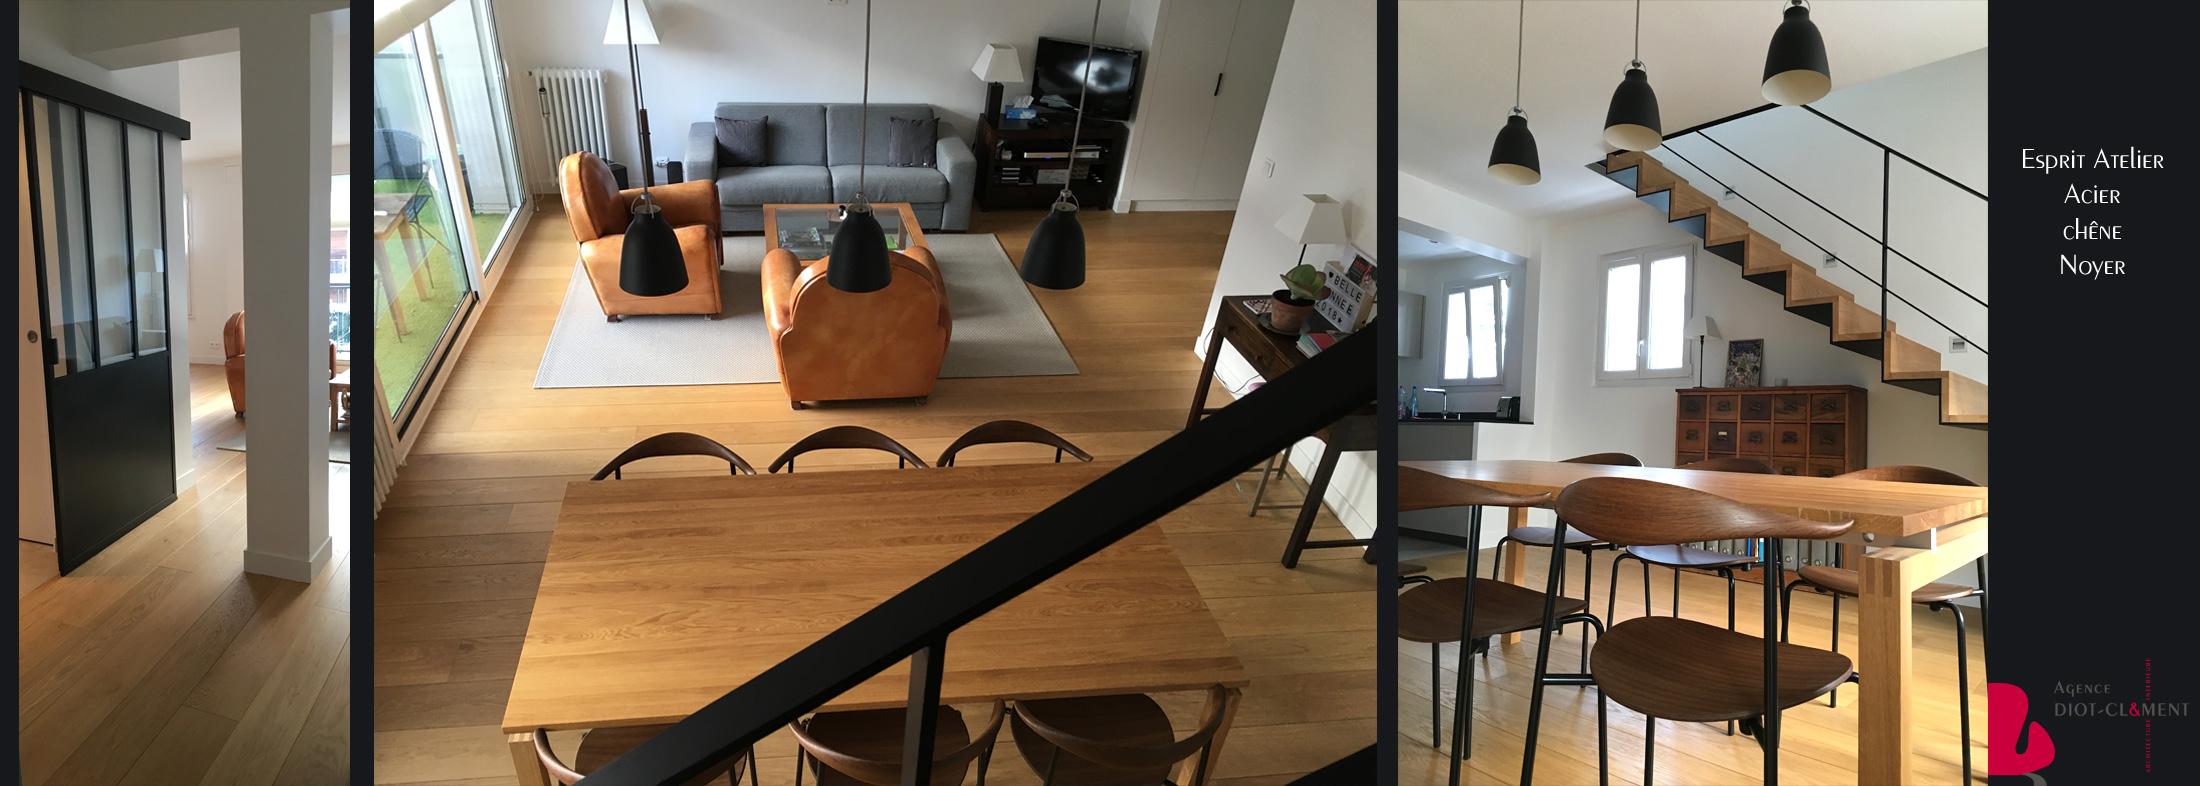 Agence Diot agence diot clement | architecture d'intérieure